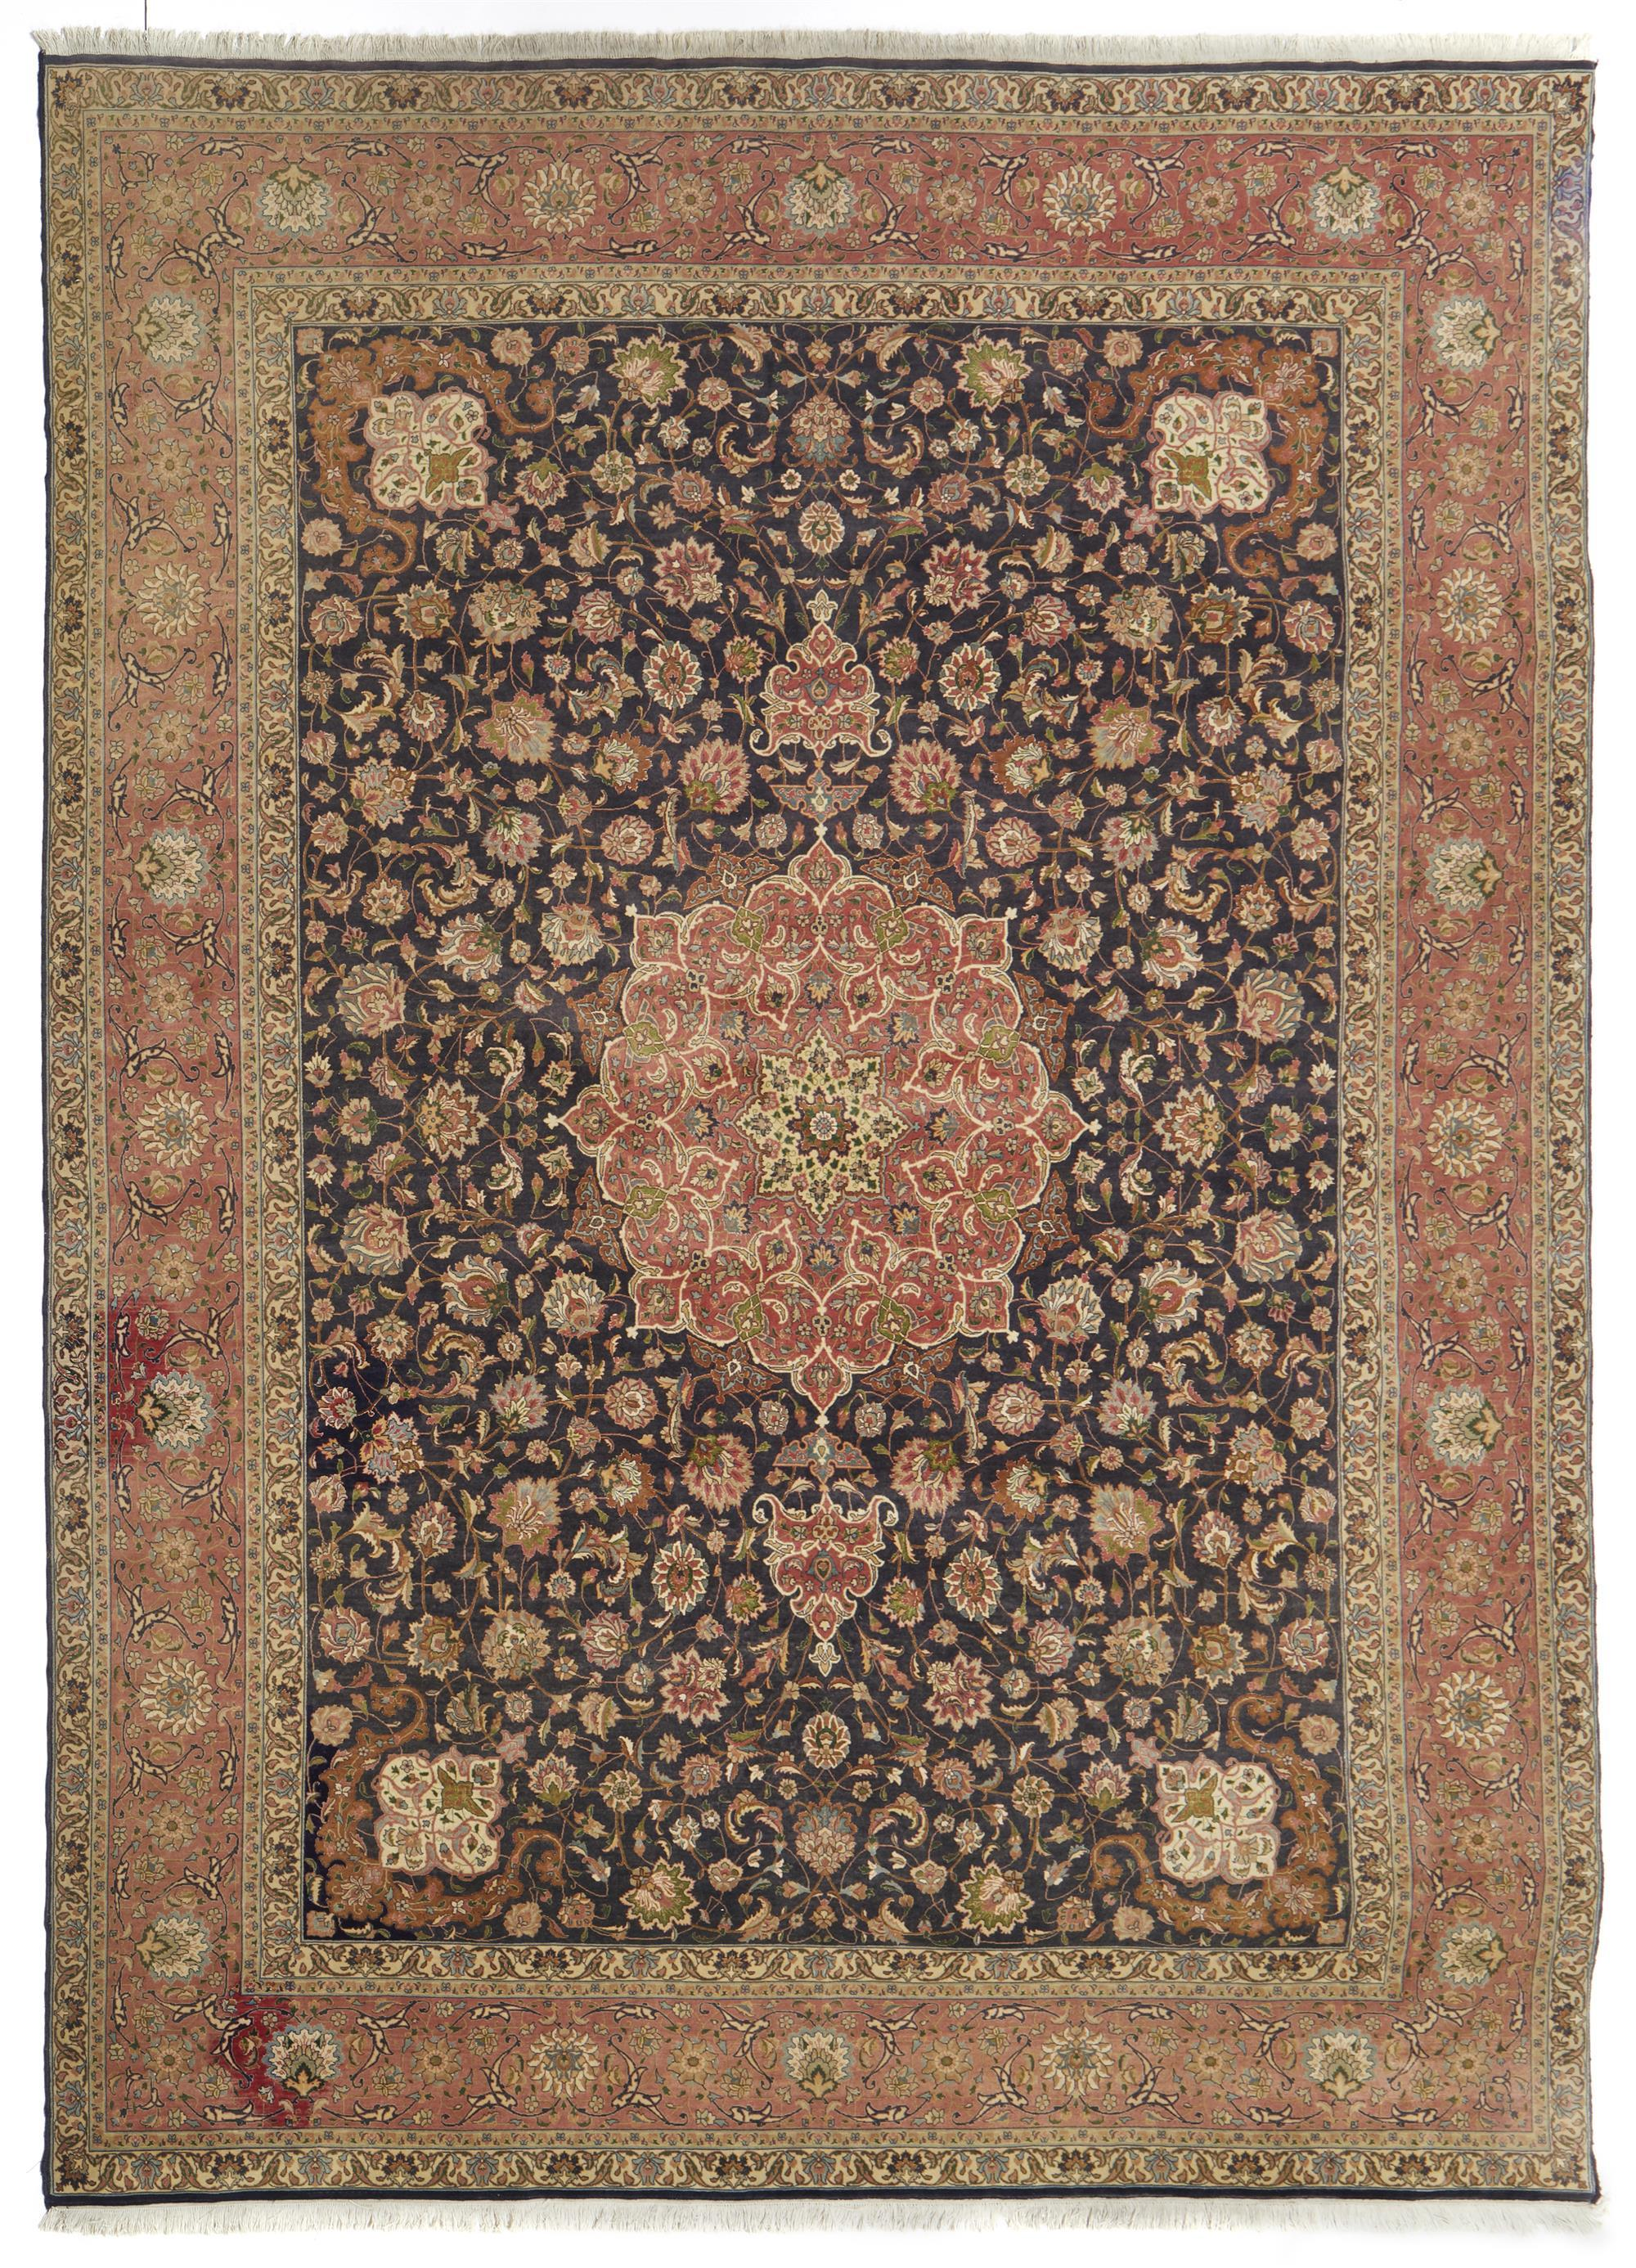 A Persian Tabriz area rug